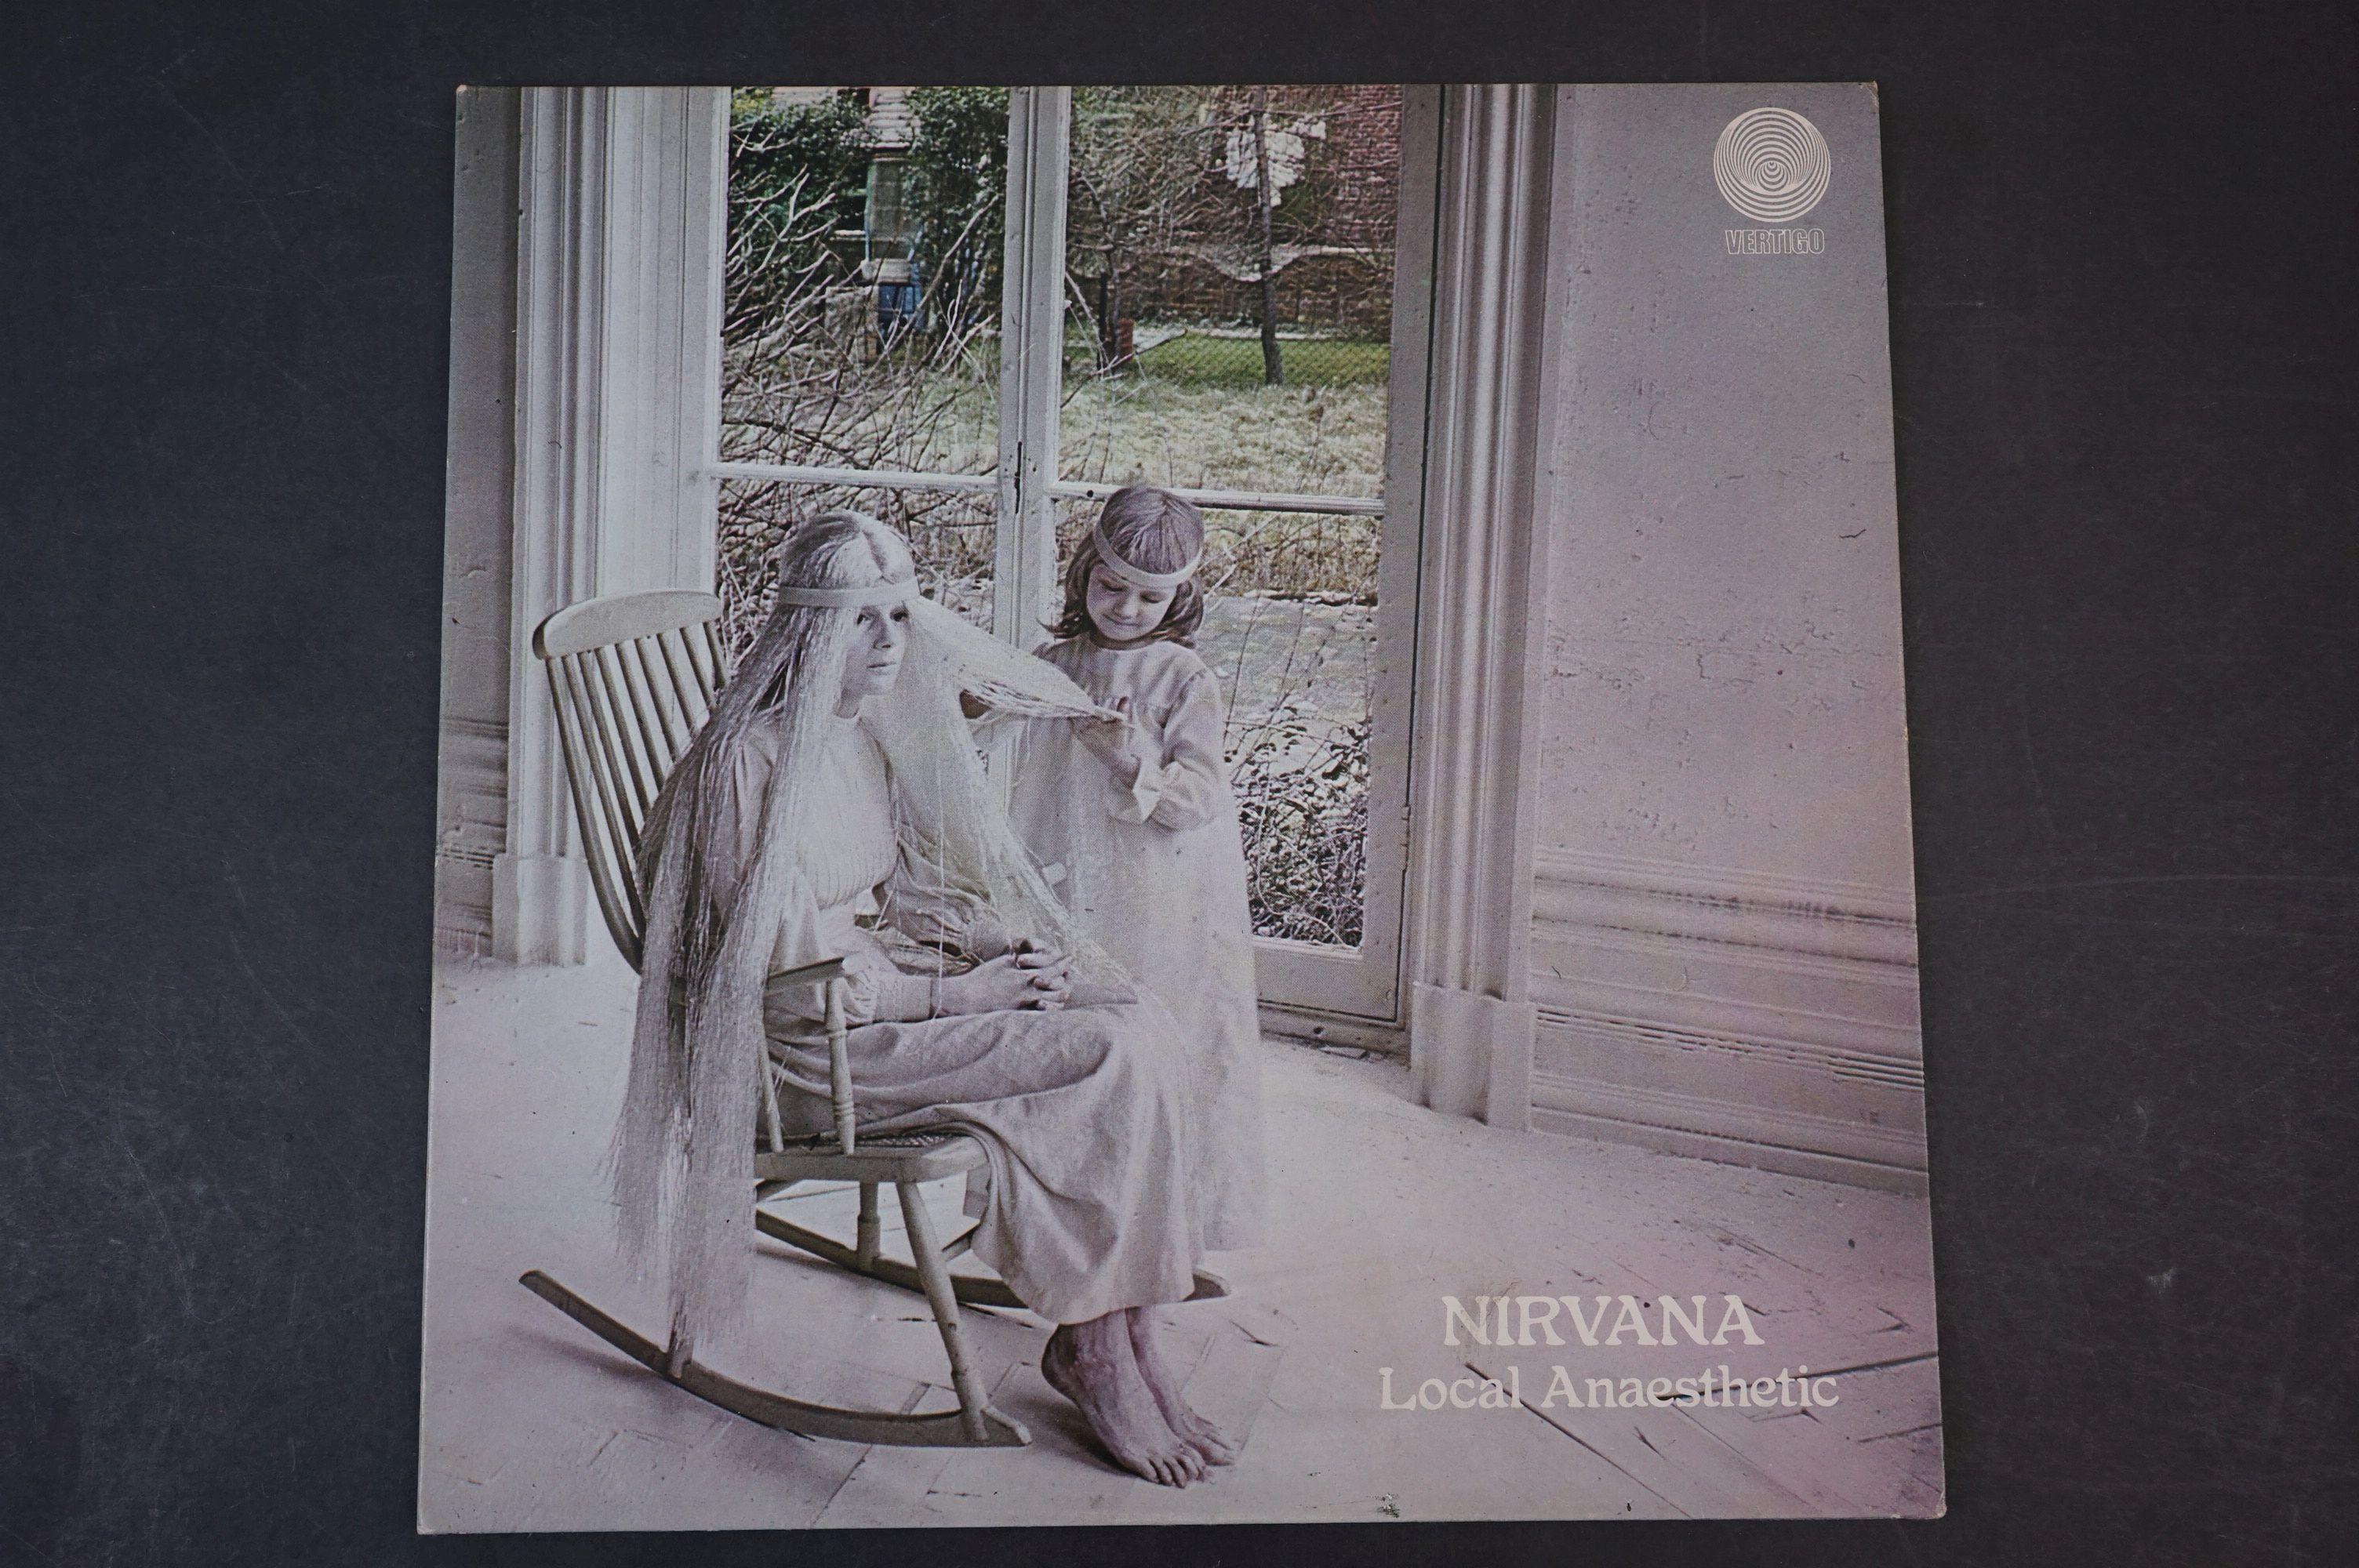 Vinyl - Nirvana Local Anaesthetic LP on Vertigo VO 6360031 gatefold sleeve, swirl logo, swirl - Image 2 of 8